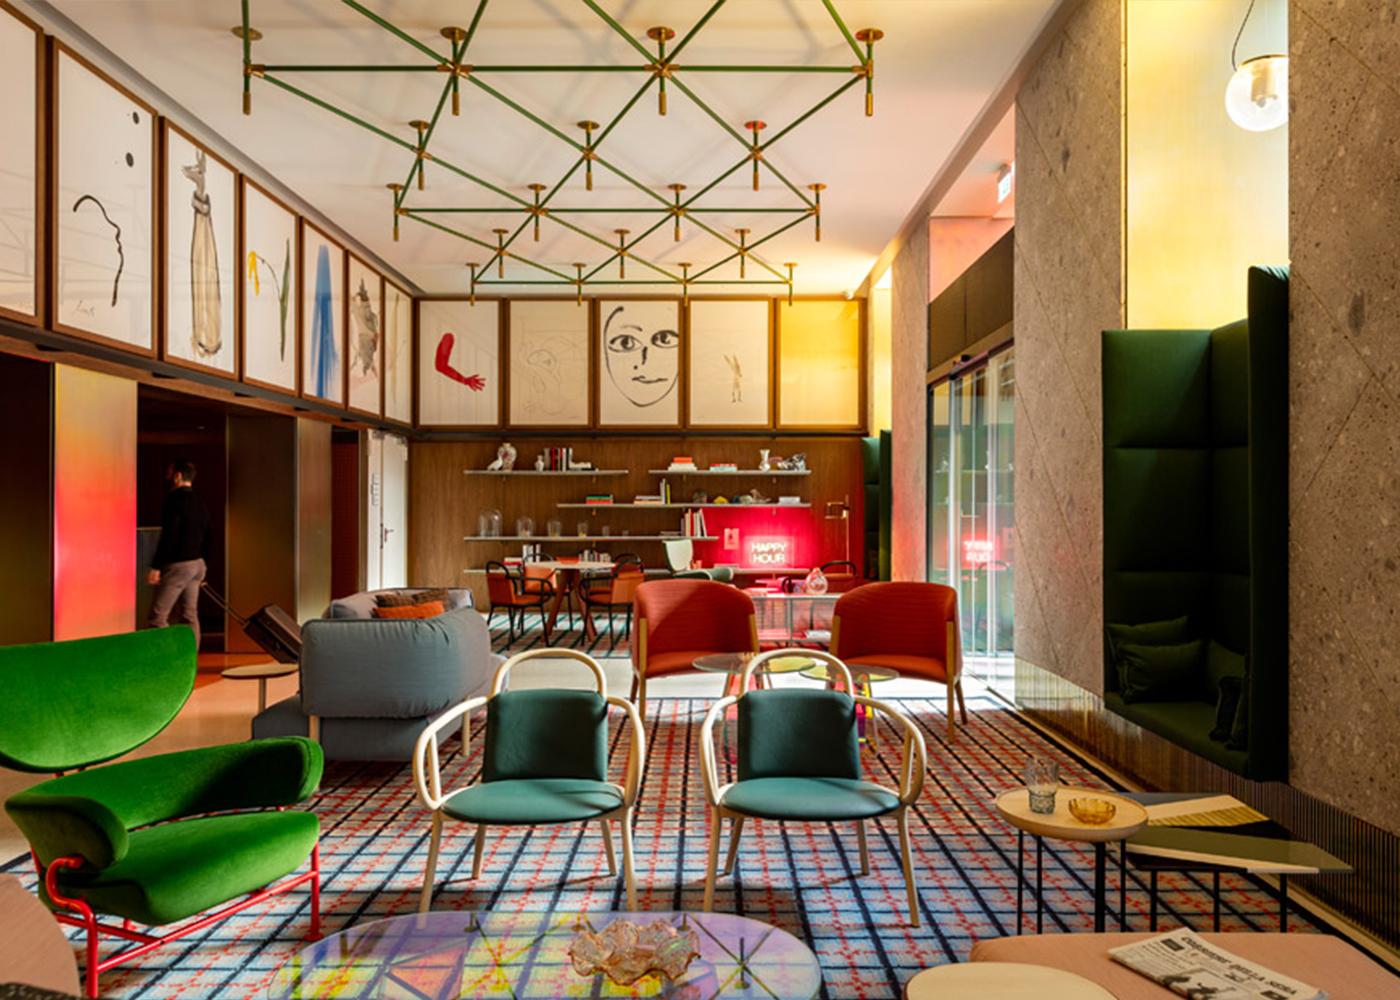 patricia-urquiola-room-mate-hotels-interior-design-milan_dezeen_936_10